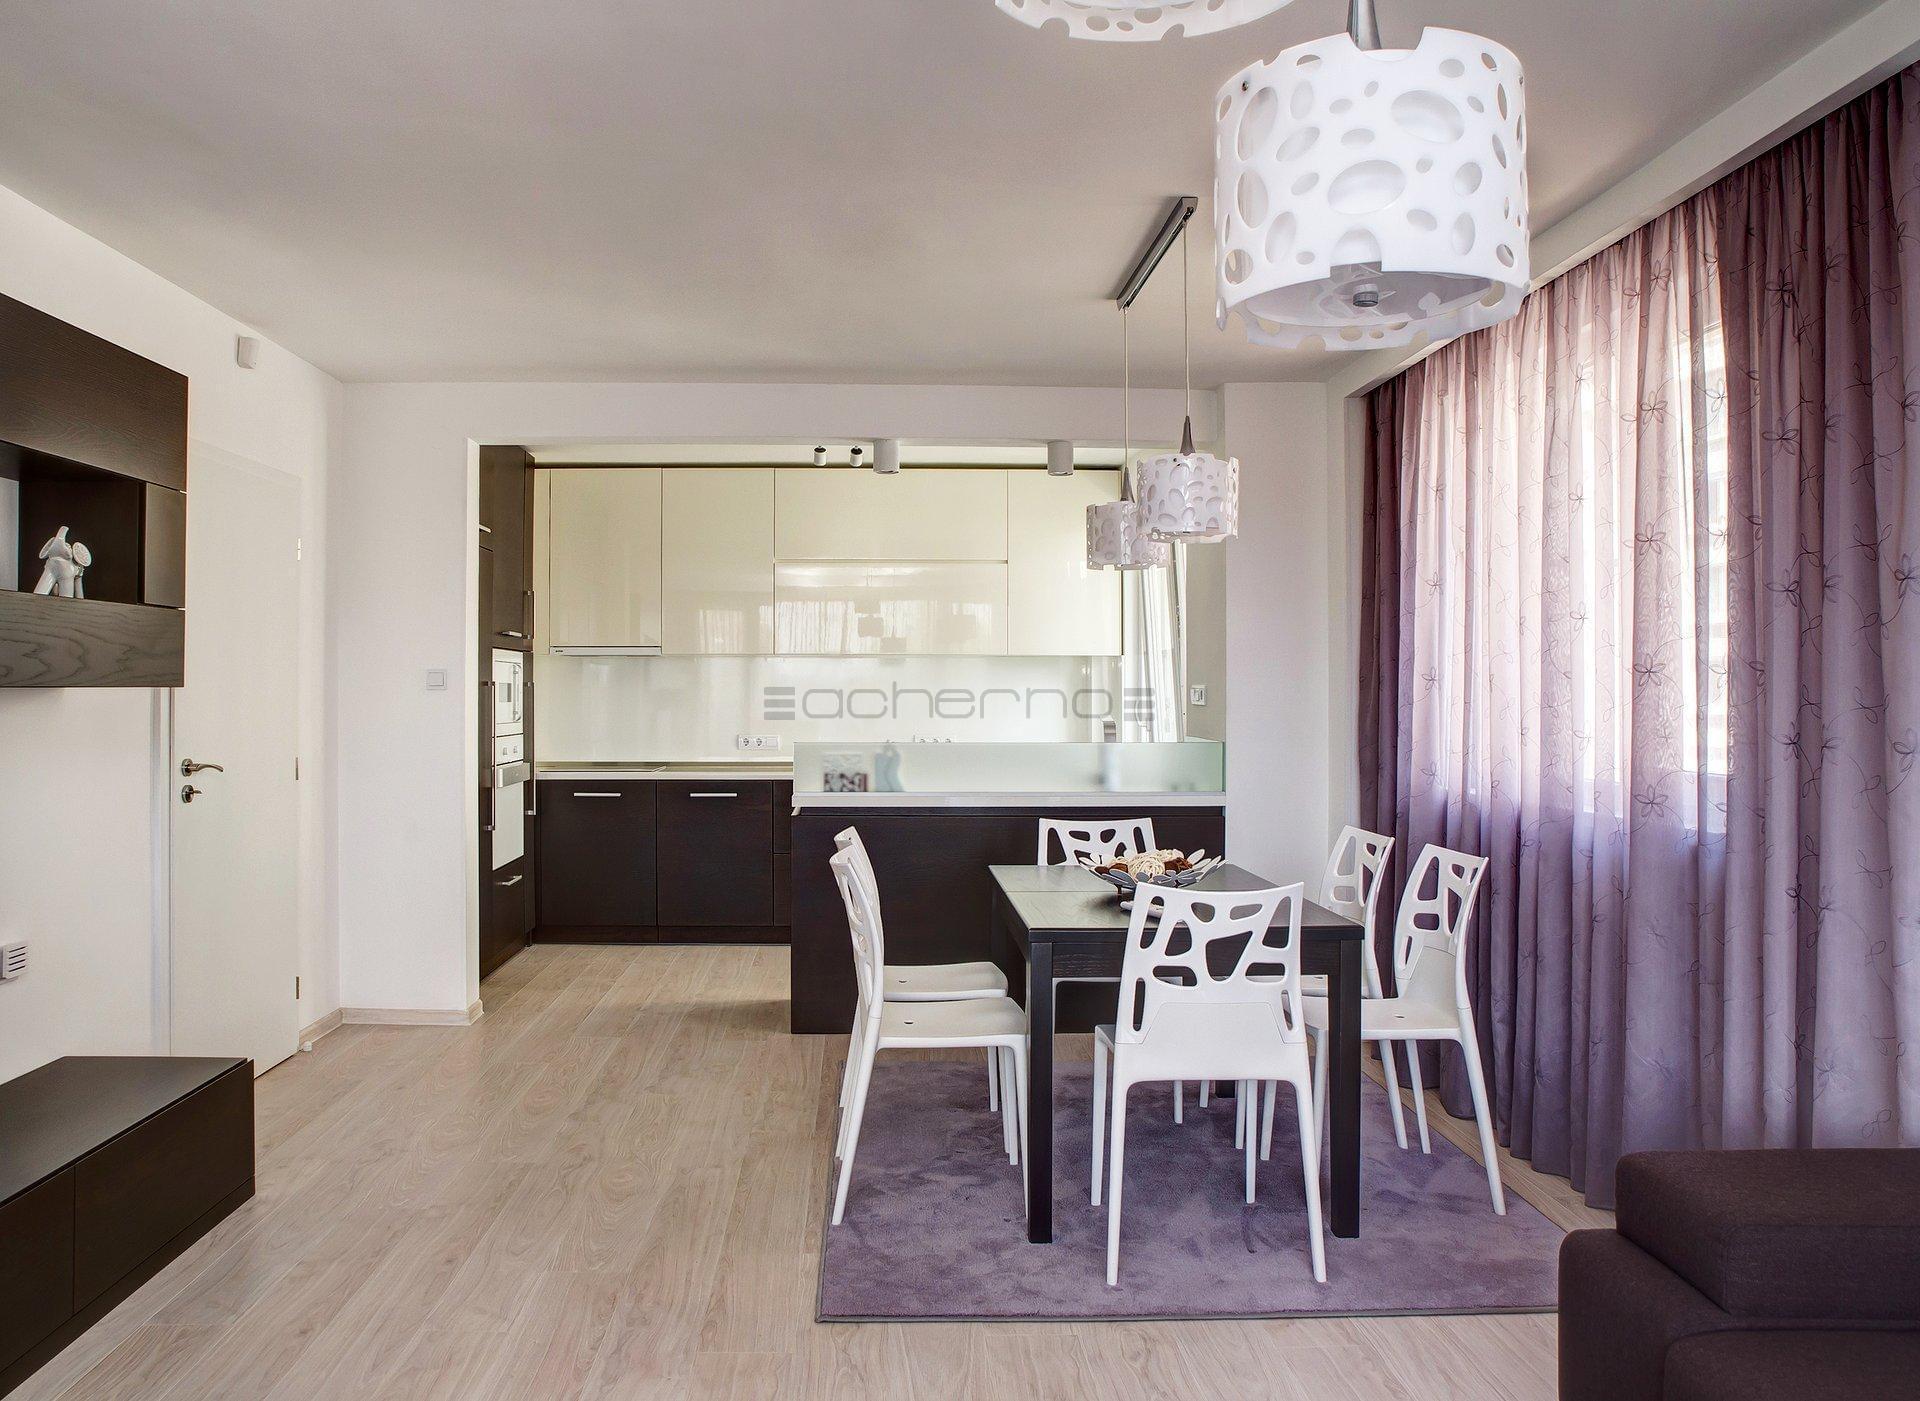 schlafzimmer farbe blau. Black Bedroom Furniture Sets. Home Design Ideas